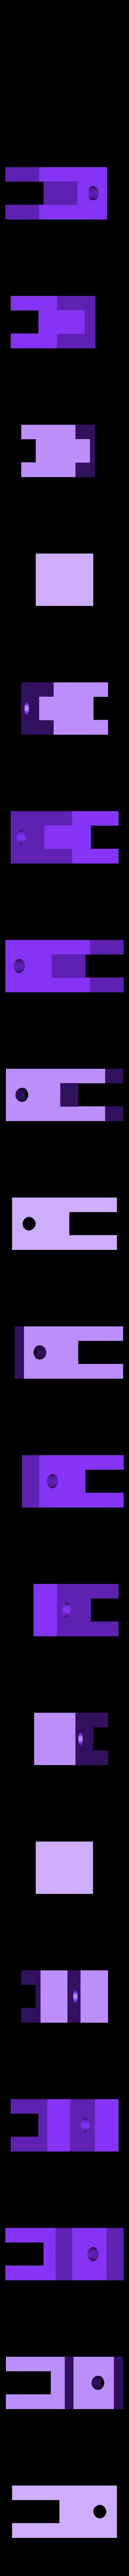 Makerbot_Clamp.stl Download free STL file MakerBot Webcam Attachment • 3D printing object, PortoCruz675